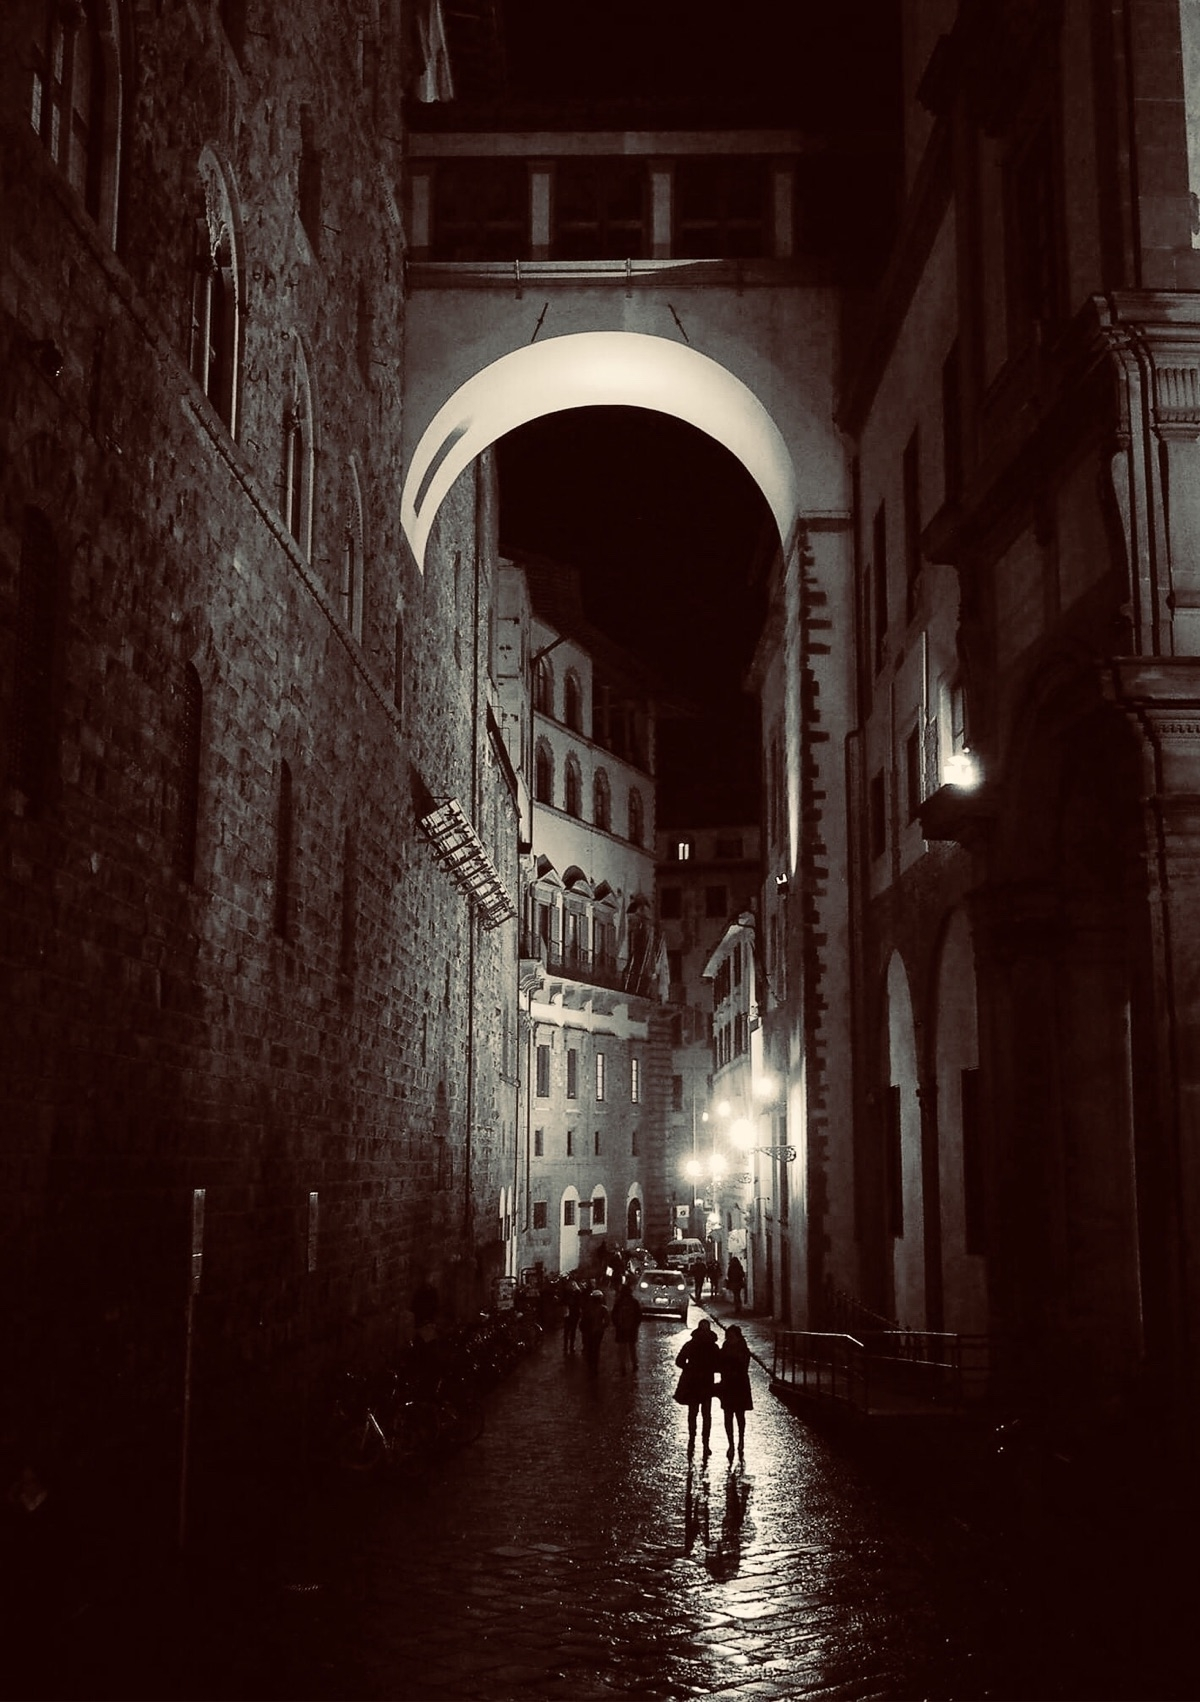 Strangers Night:moon: Florence - momiroh | ello